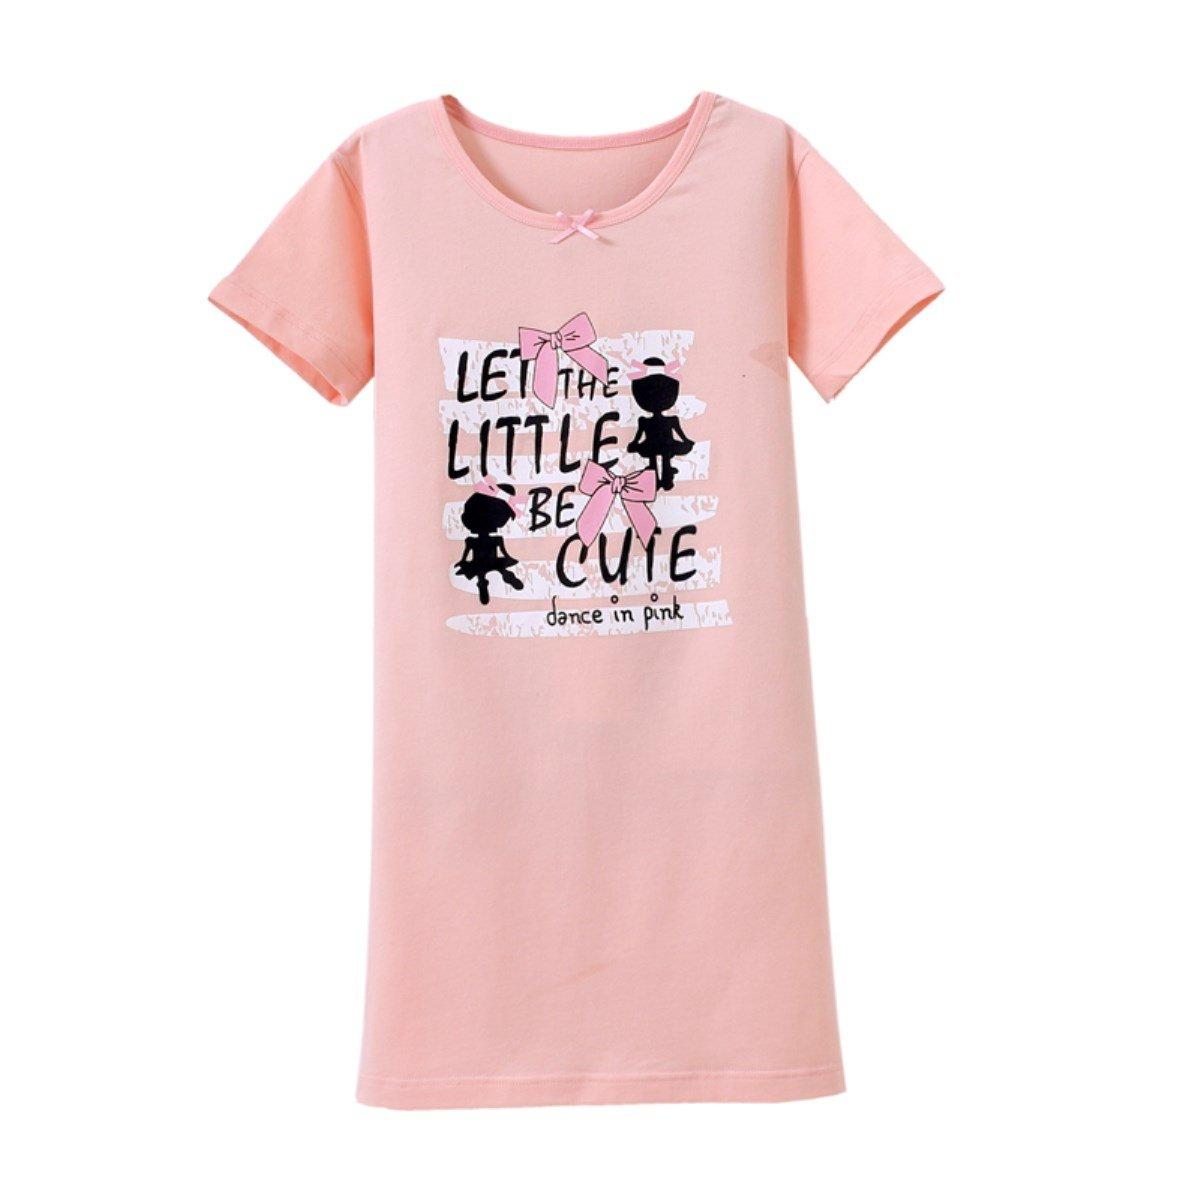 HOYMN Baby Girls' Princess Nightgowns Bowknot Sleep Shirts Cotton Sleepwear